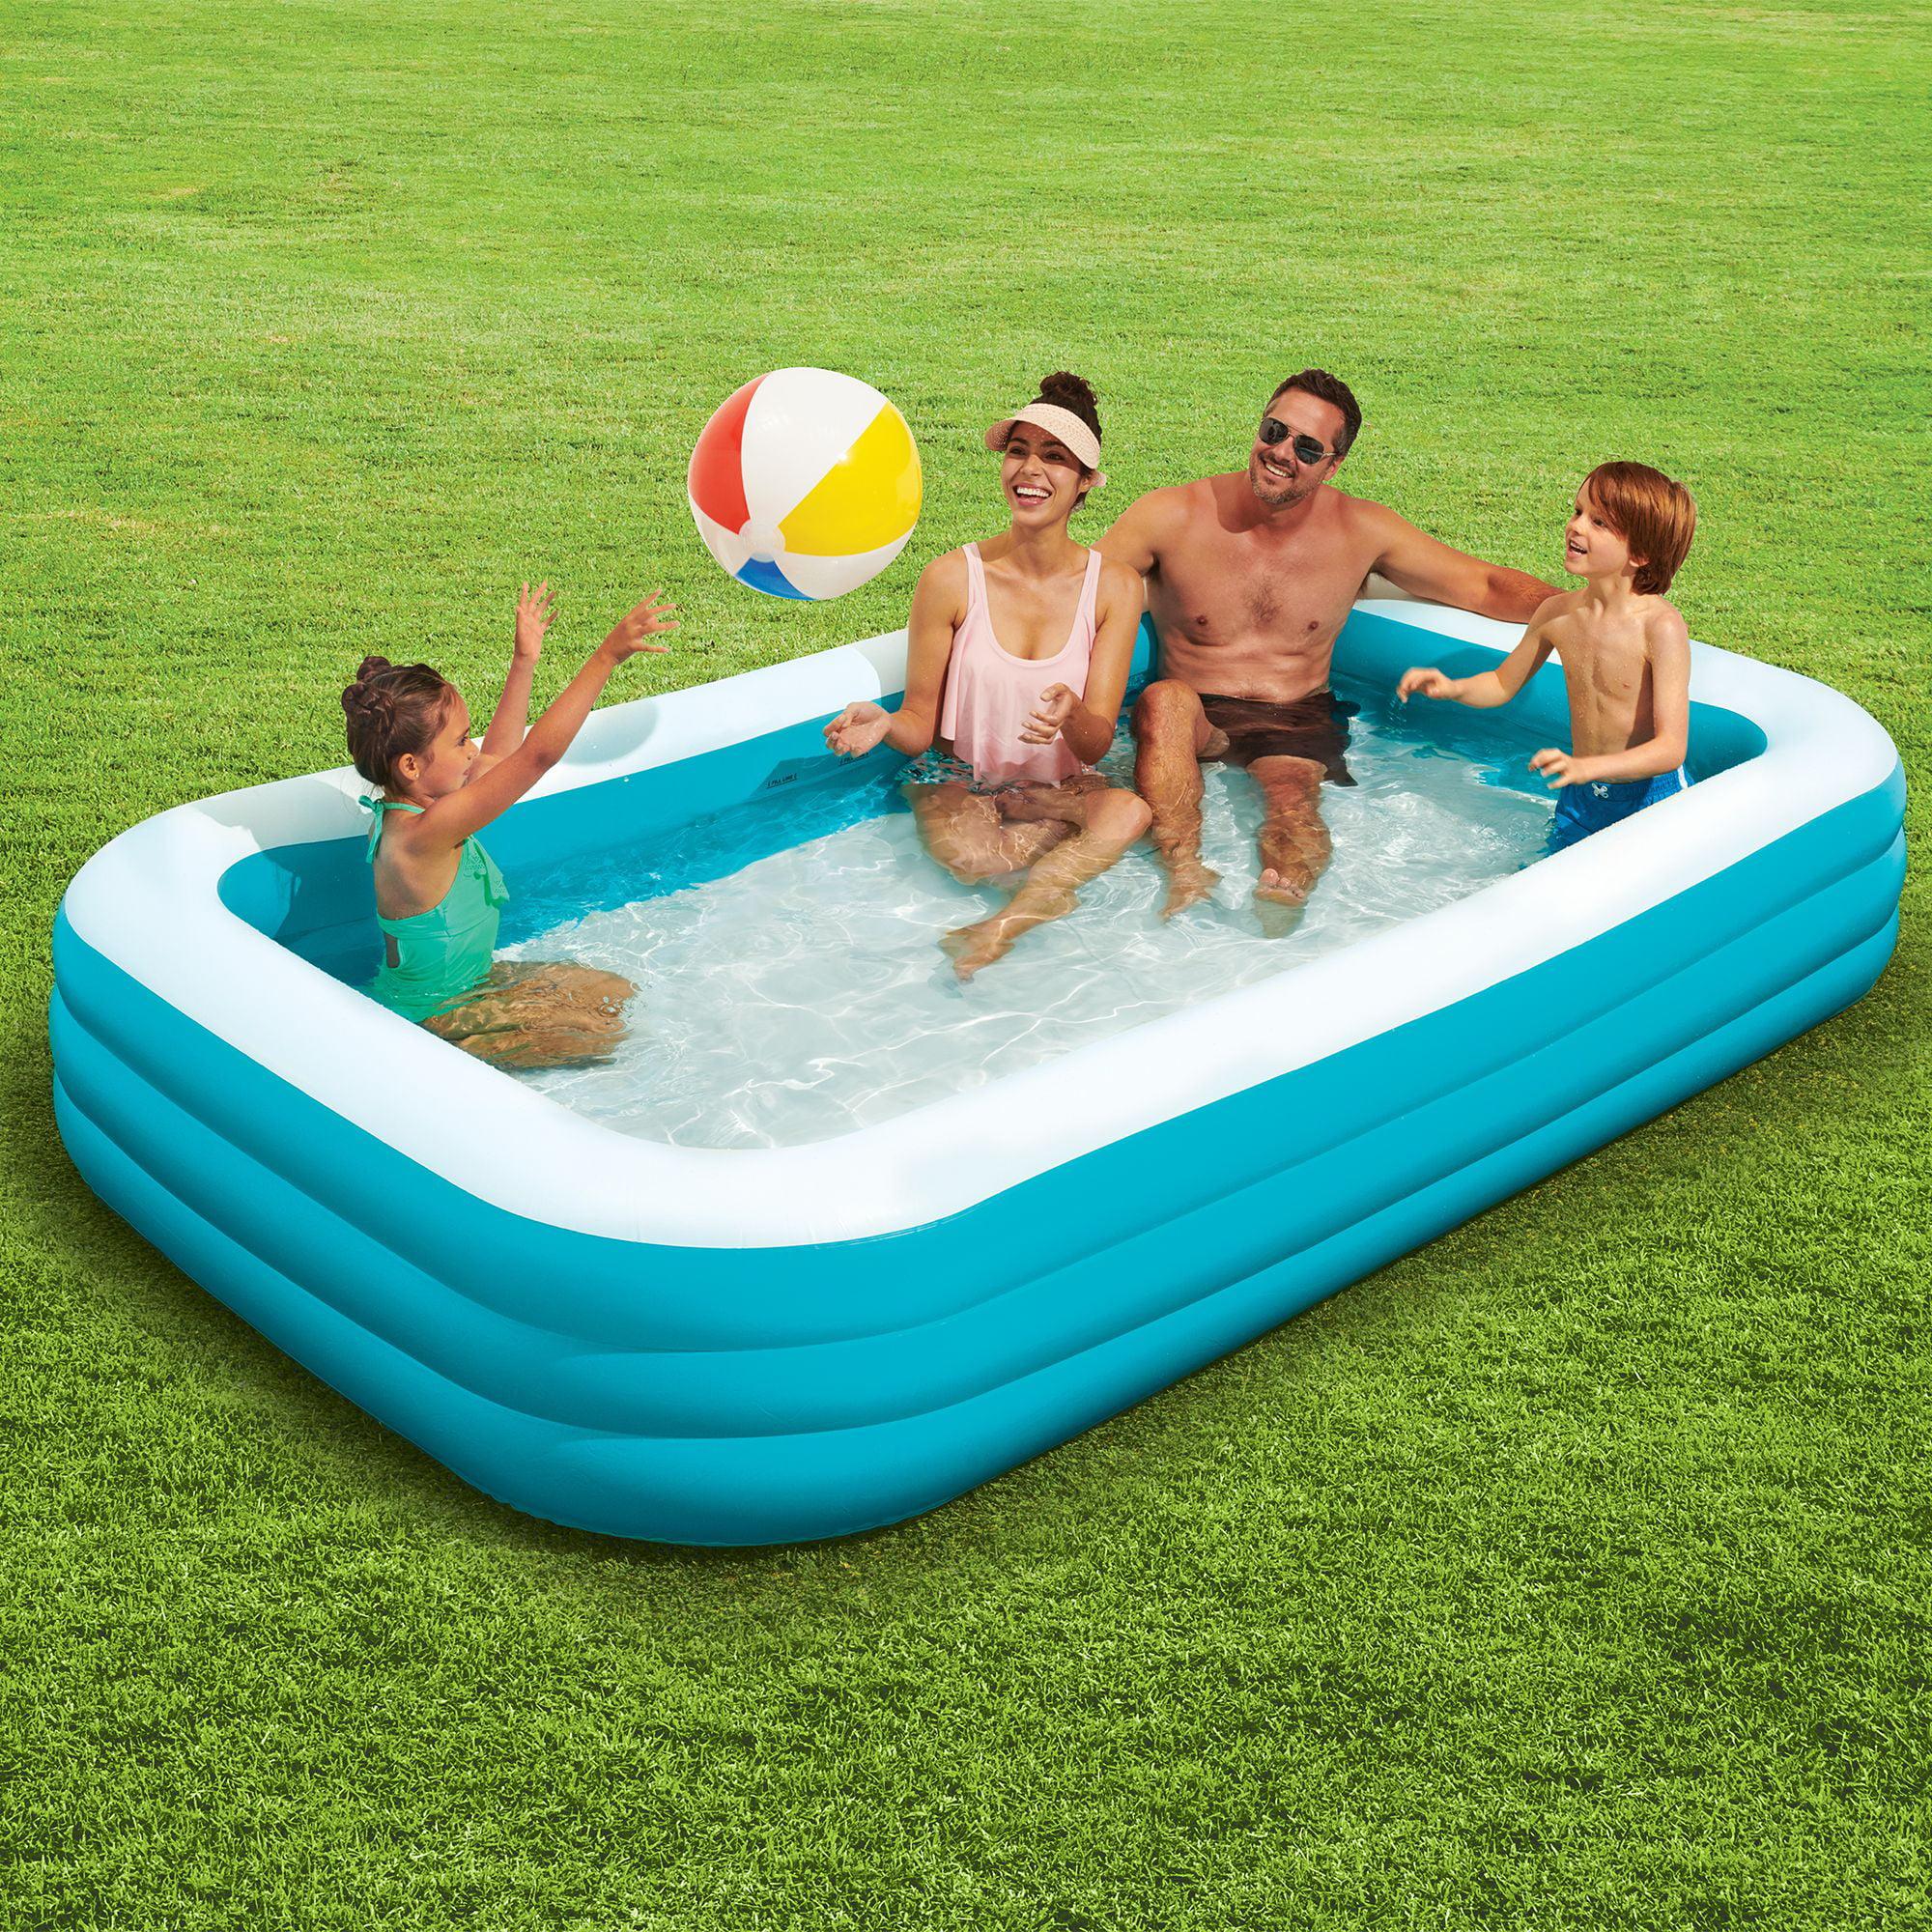 Play Day Rectangular Inflatable Family Pool 120 X 72 X 22 Walmart Com Walmart Com